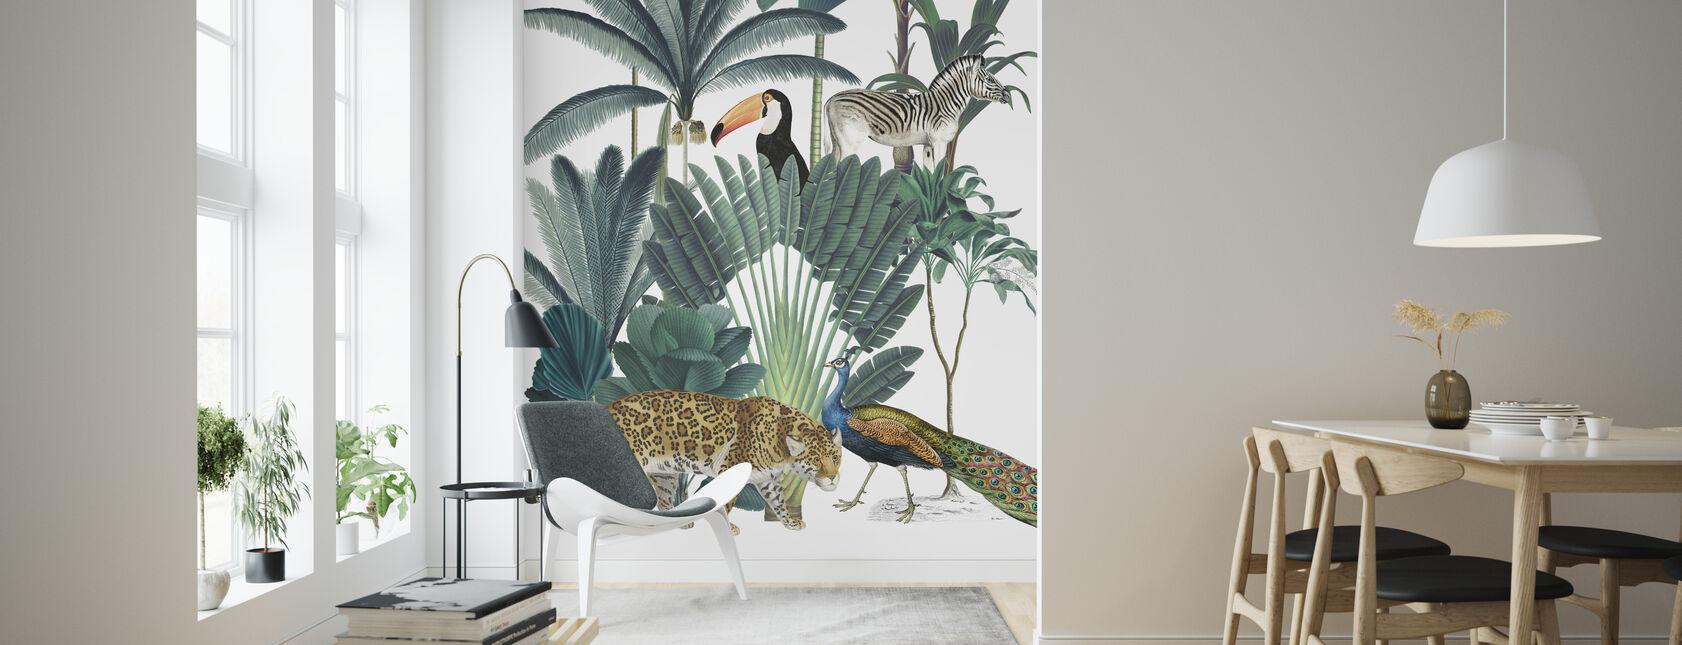 Royal Palms - Wallpaper - Living Room